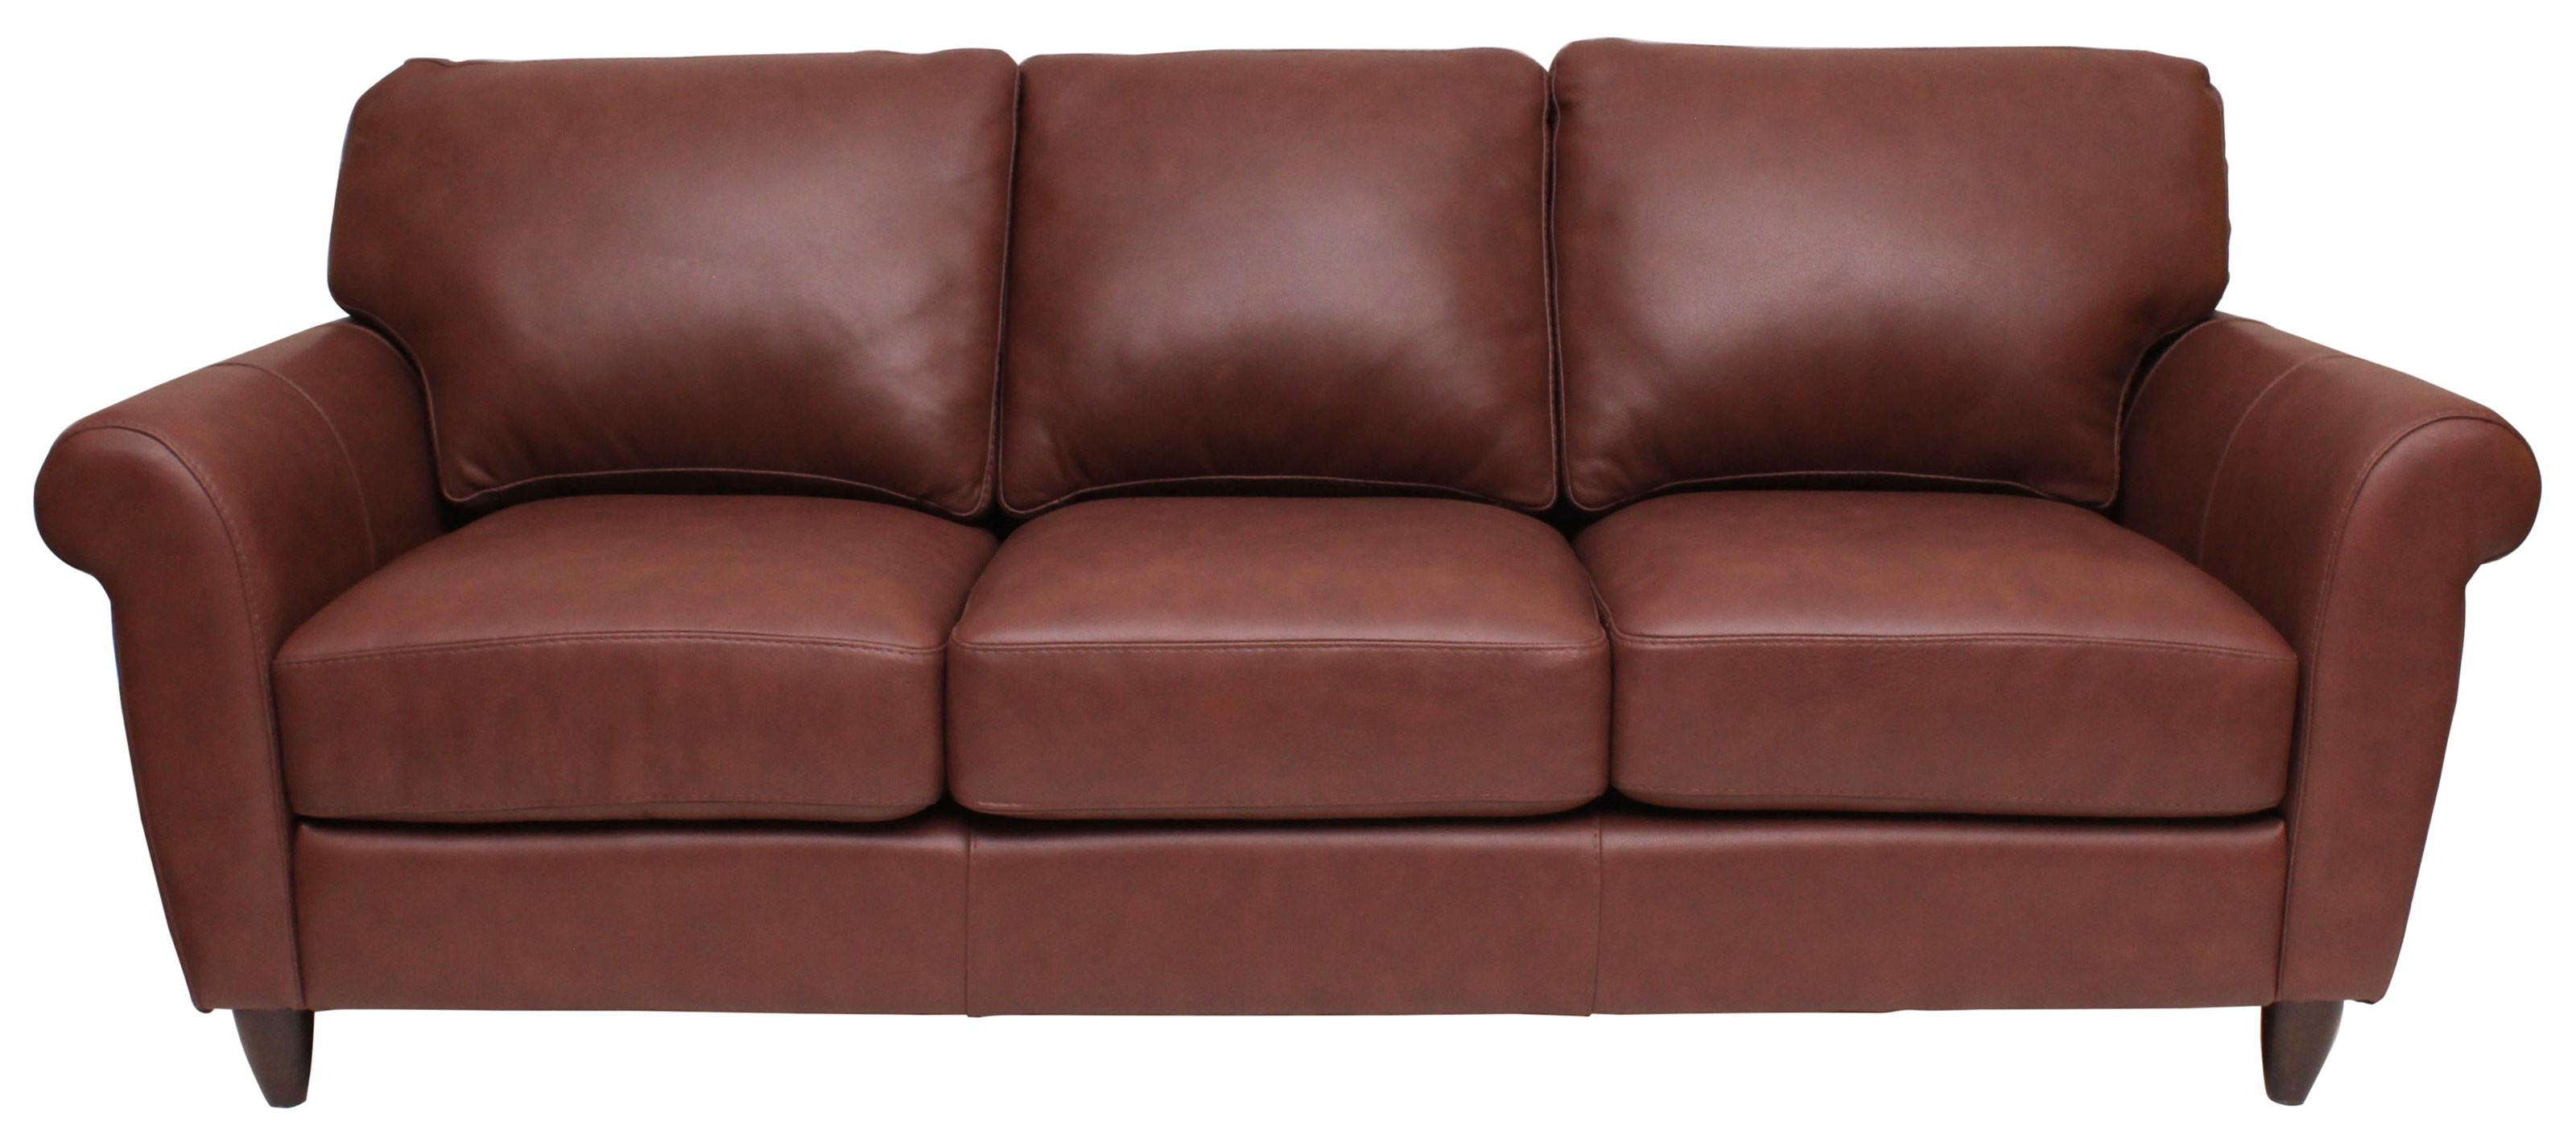 Cameo Sofa by Omnia Leather at HomeWorld Furniture